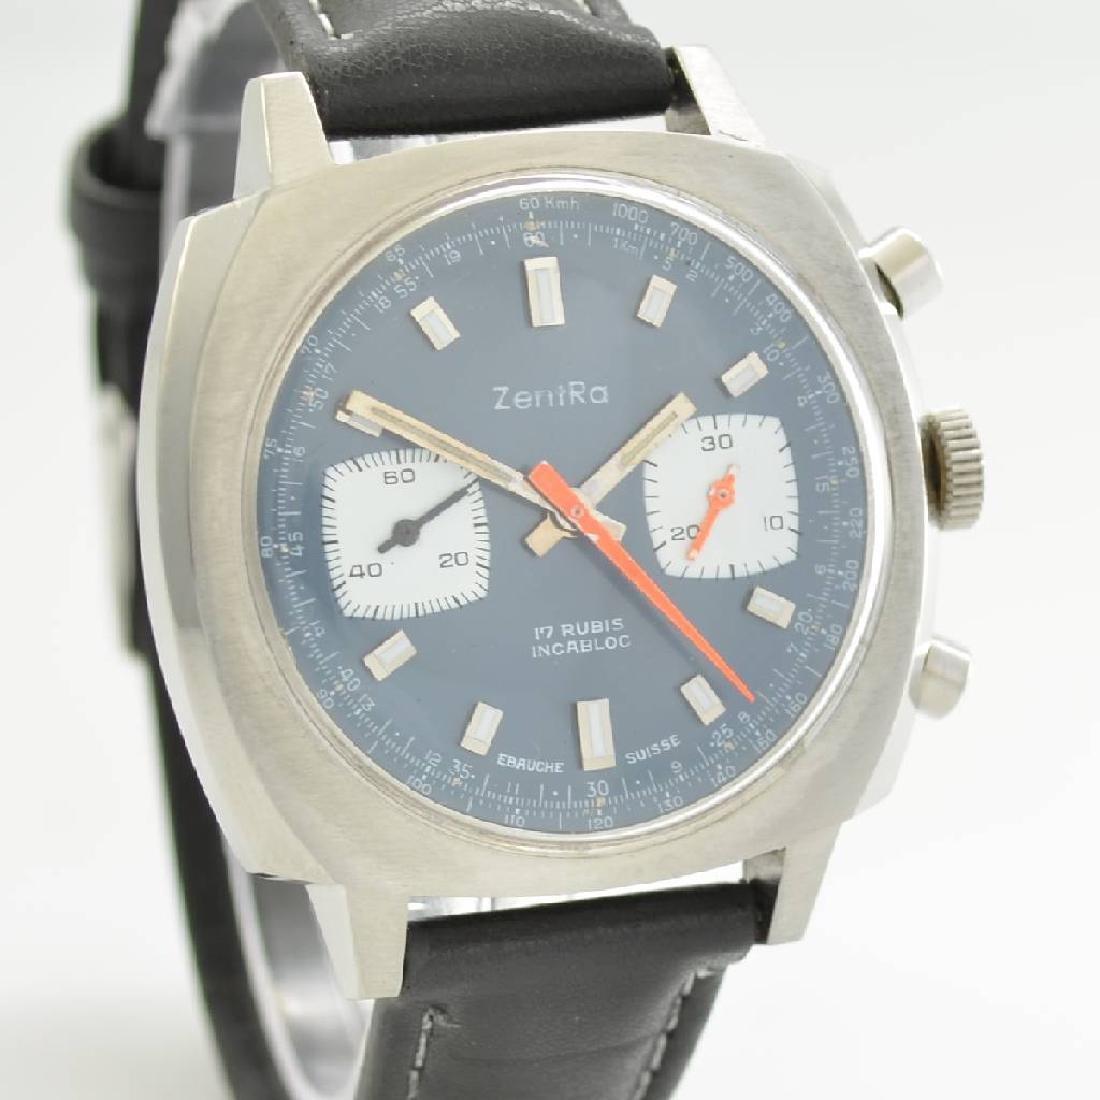 ZENTRA chronograph, Switzerland around 1970 - 6